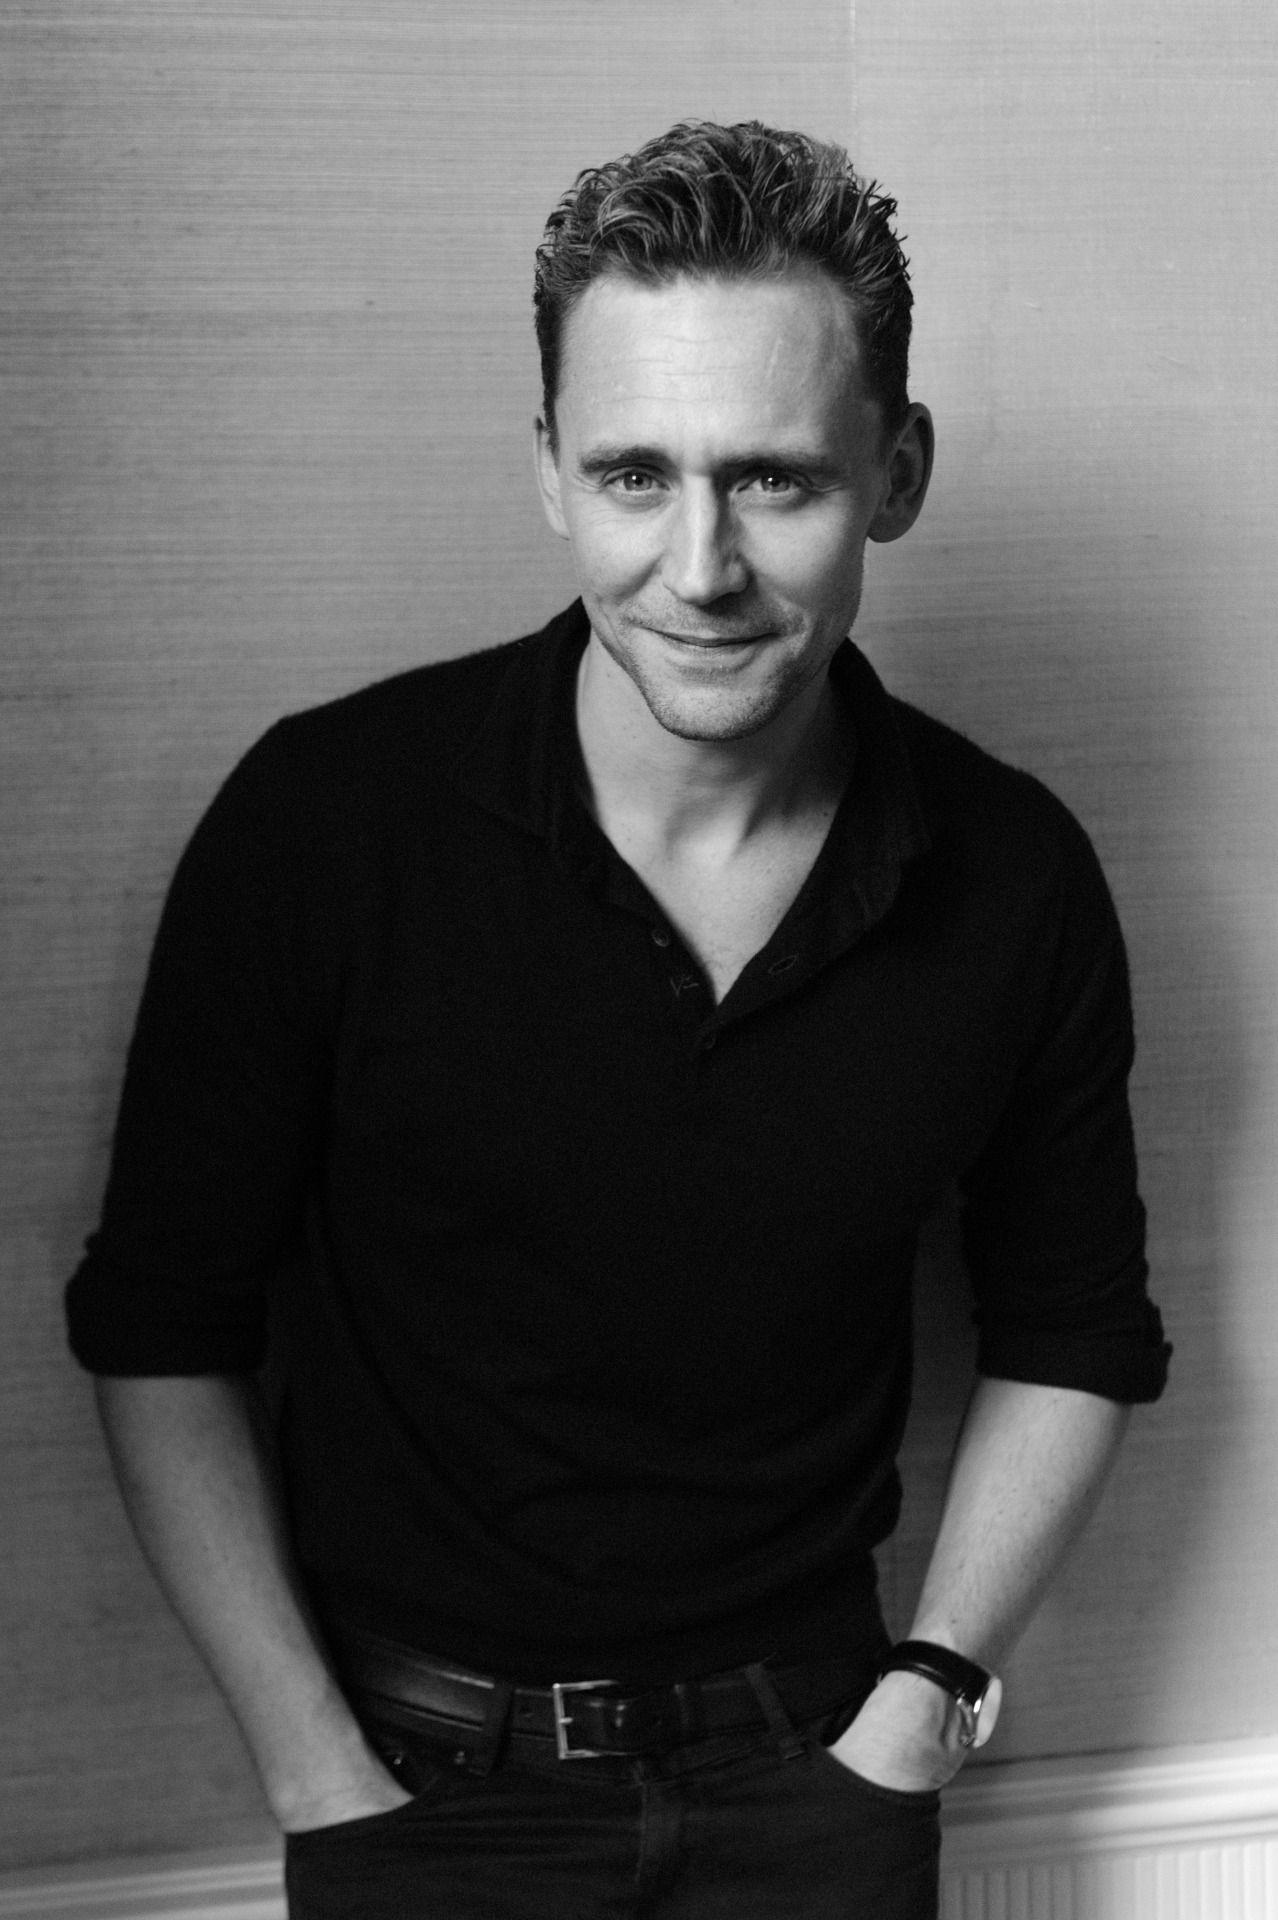 Tom Hiddleston Edit by jennphoenixtumblr blr